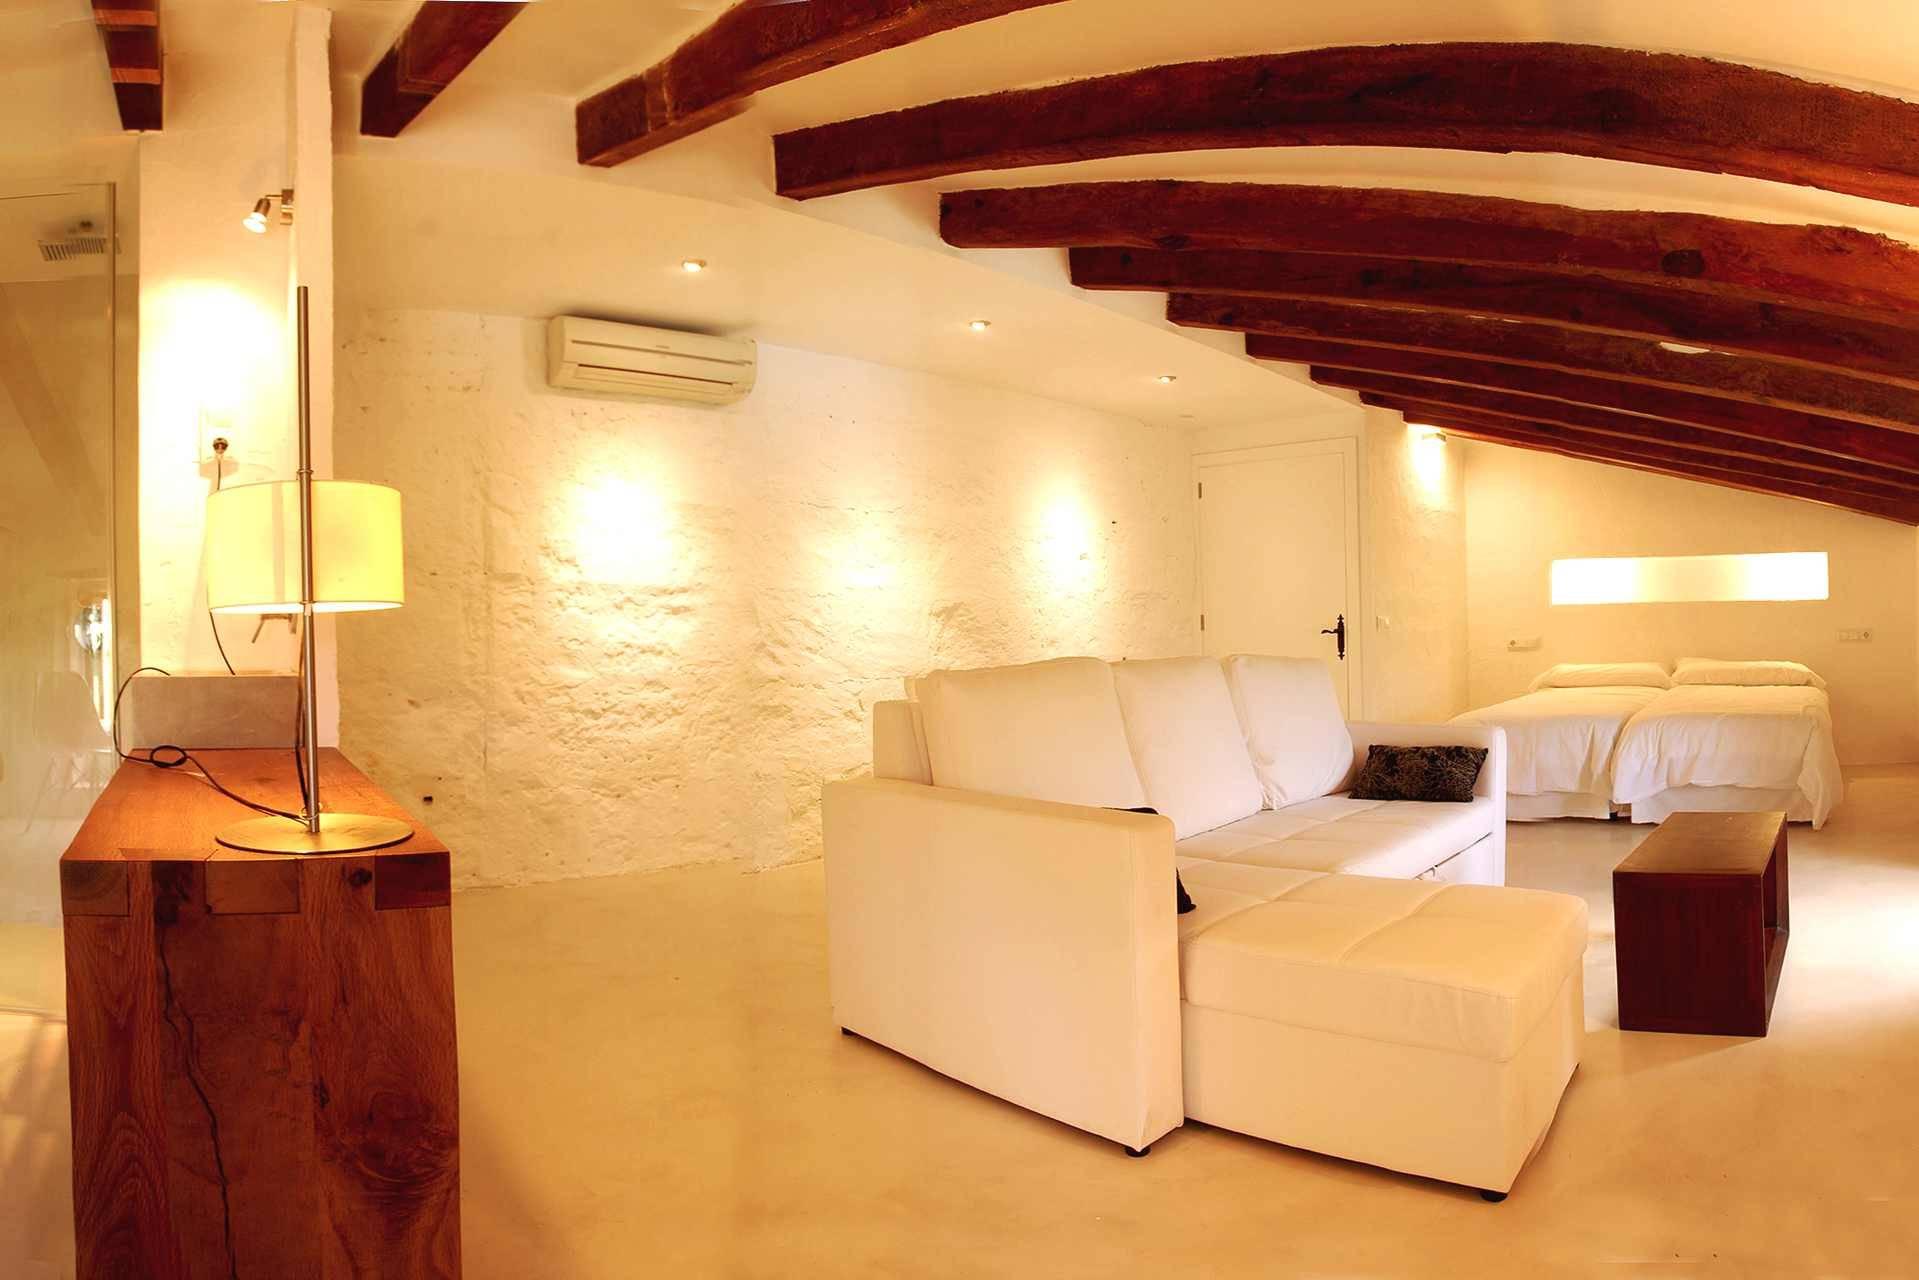 01-06 Charming Holiday Home Mallorca north Bild 27